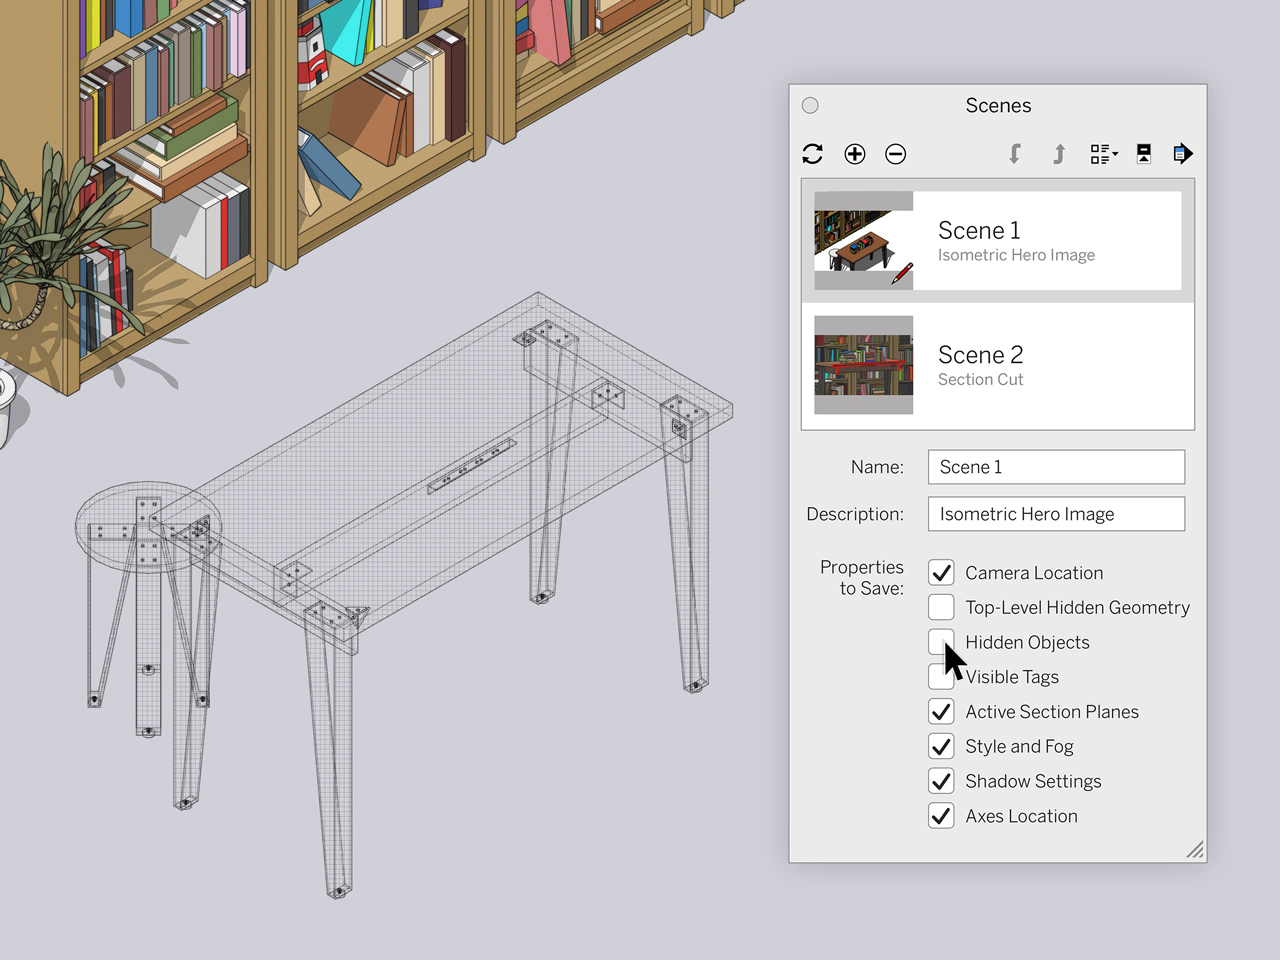 sketchup 2020.1 update scenes